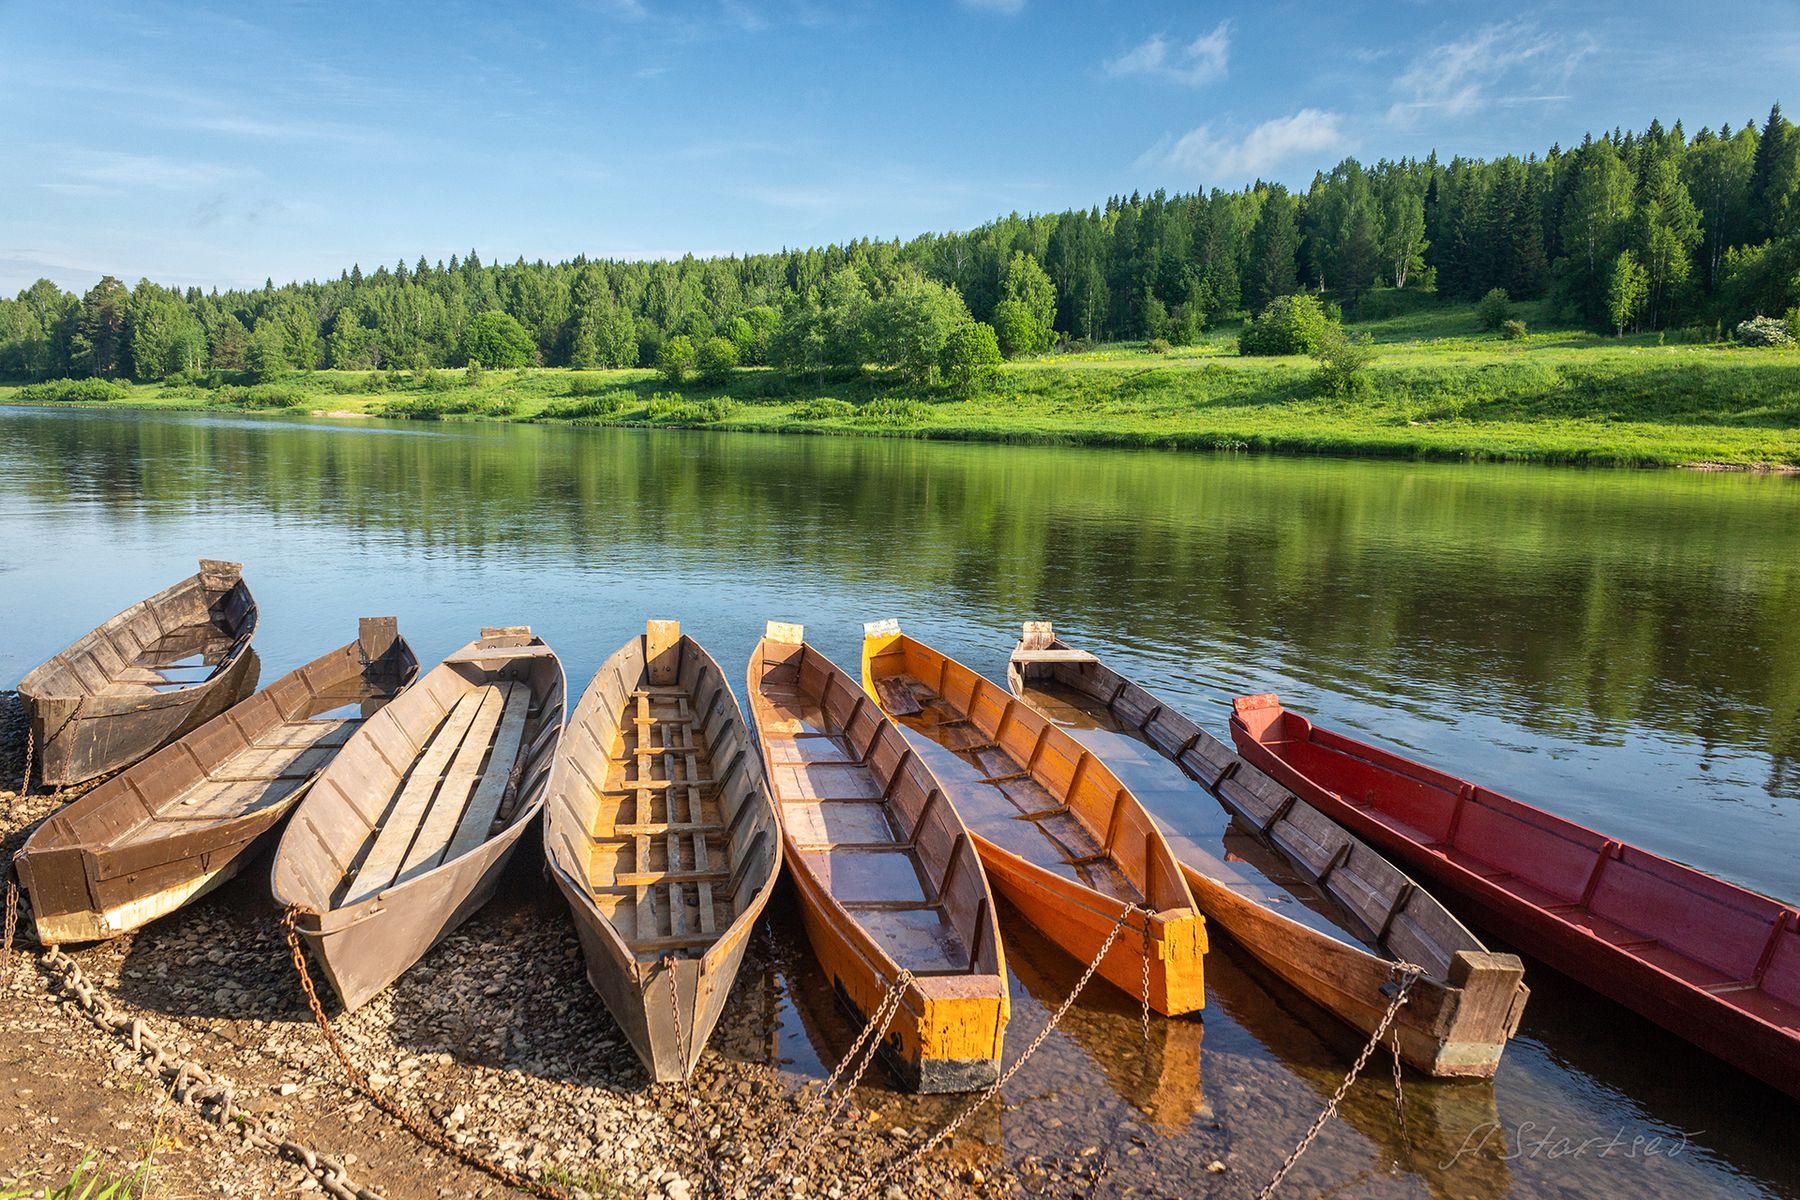 Лодки лето река Чусовая Урал Пермский_край лодки пейзаж небо вода лес